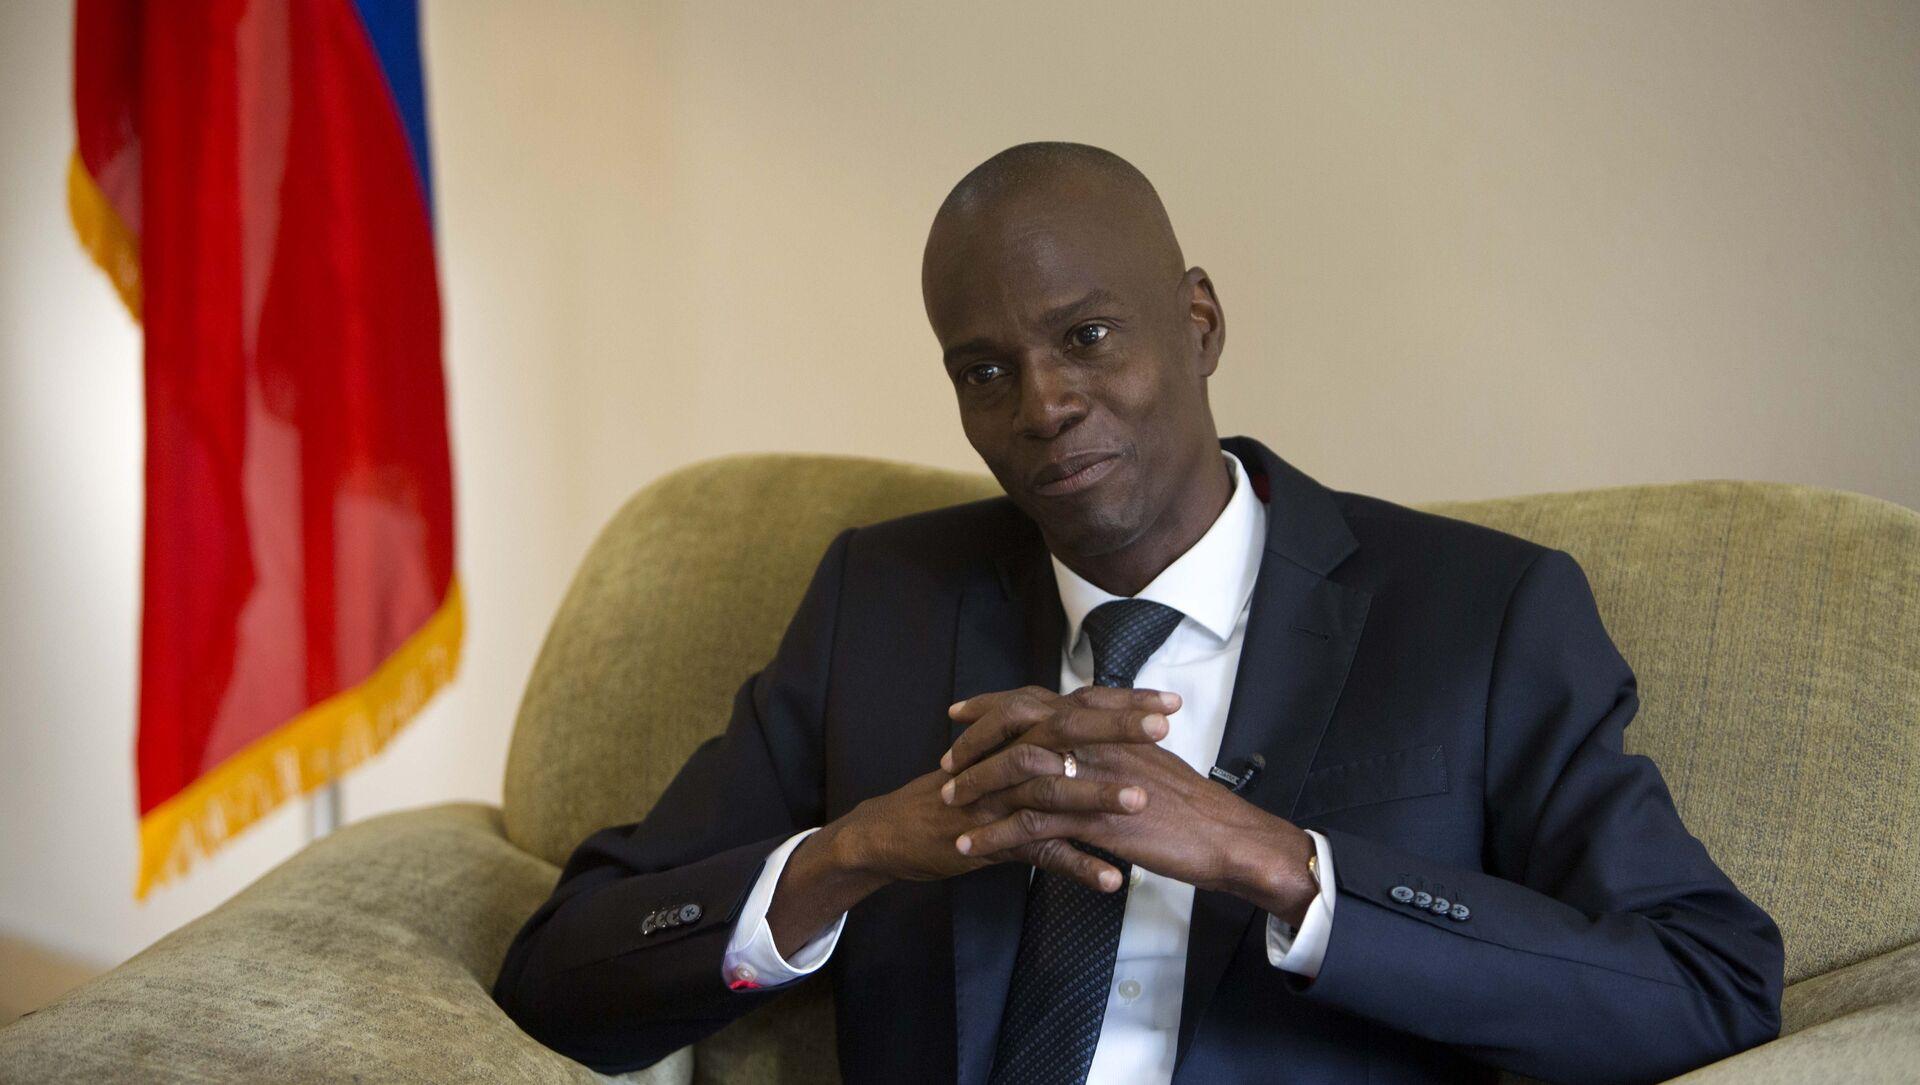 Jovenel Moise, presidente de Haití (archivo) - Sputnik Mundo, 1920, 07.02.2021